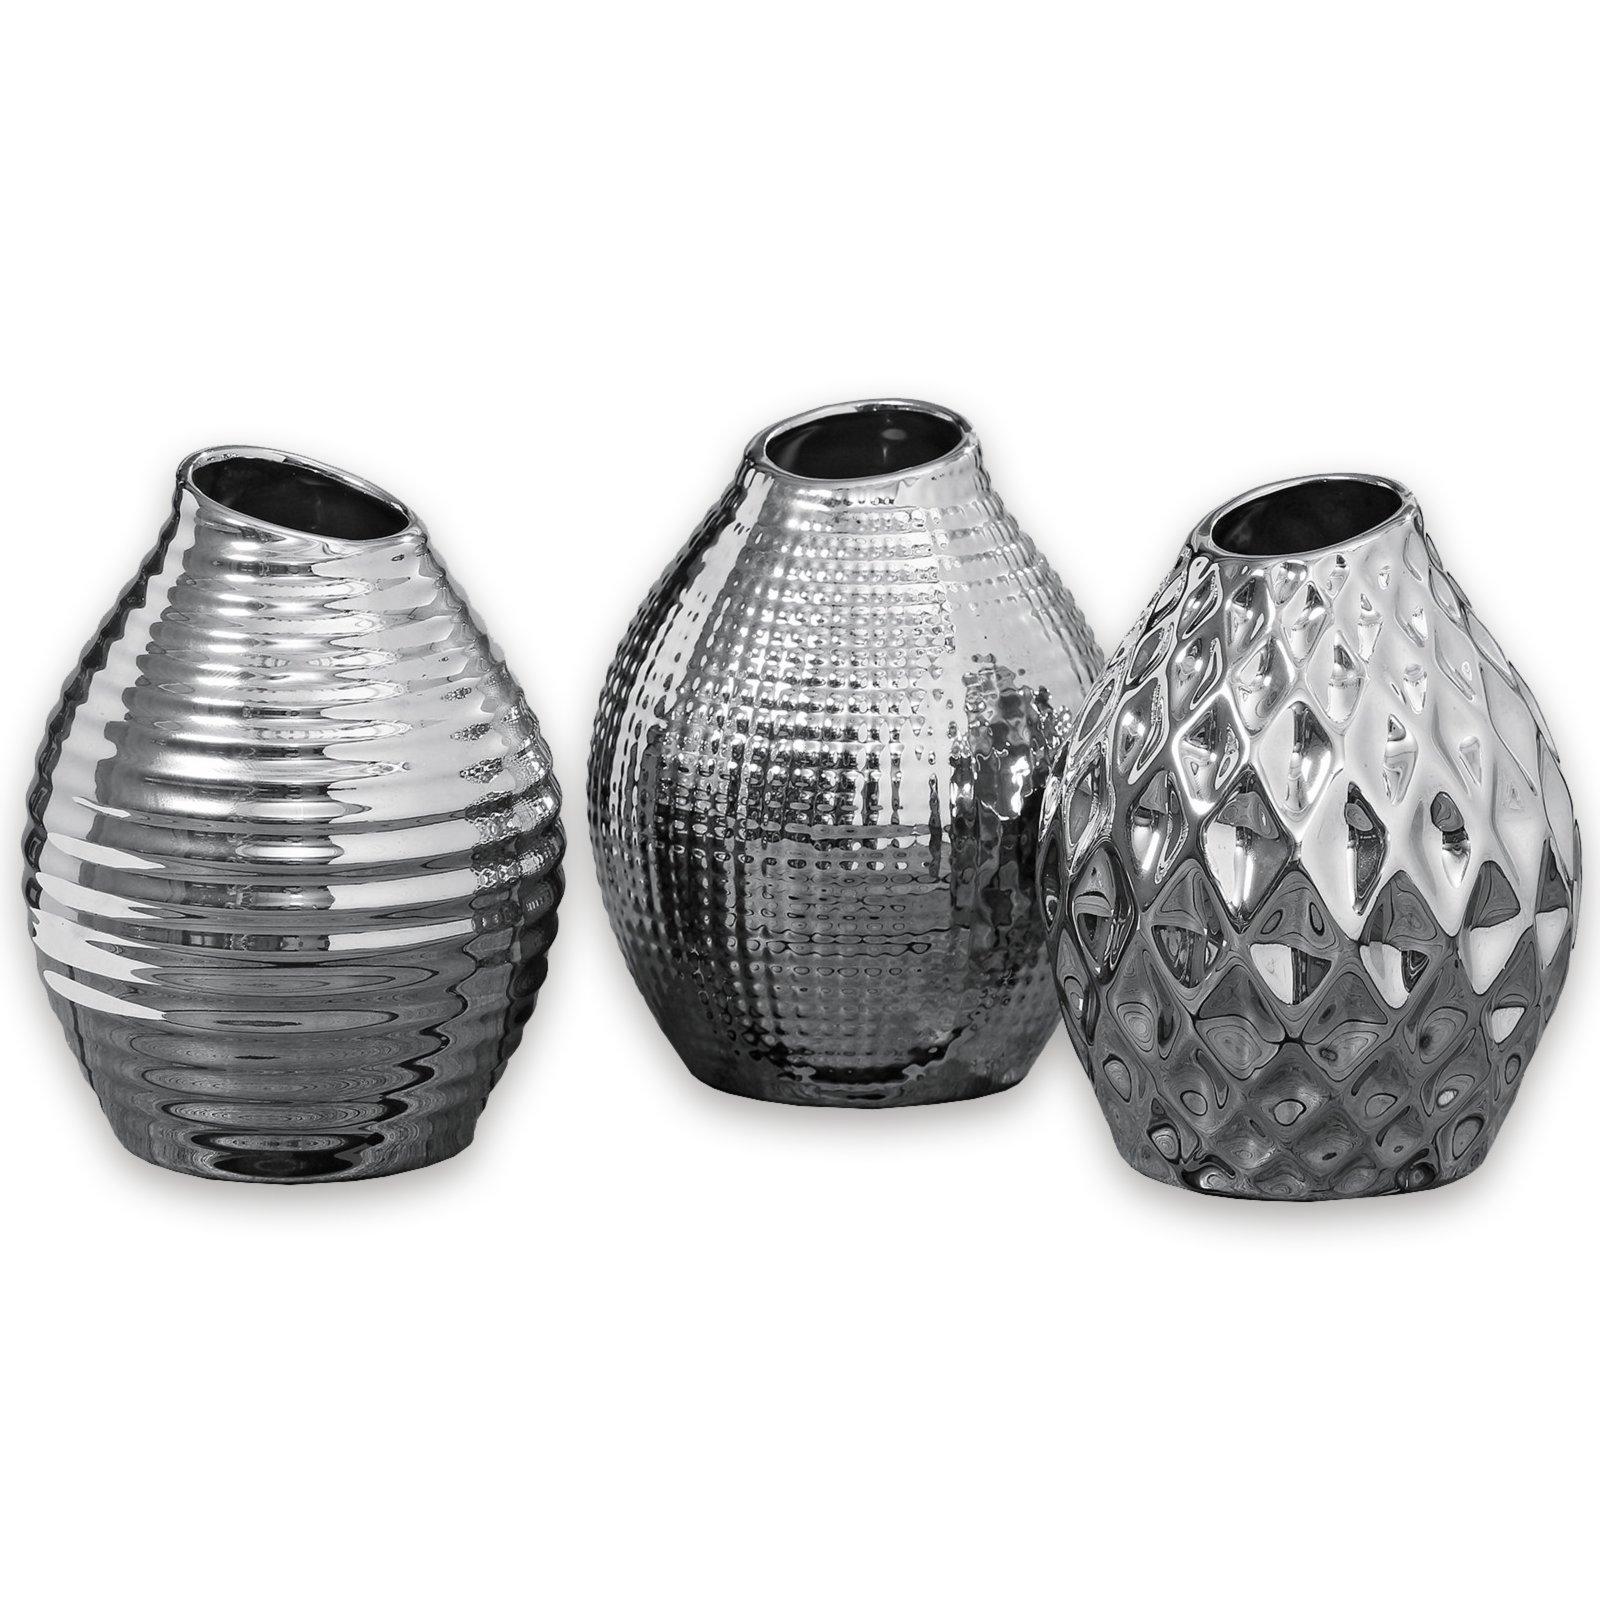 vase celly porzellan silber verschiedene designs. Black Bedroom Furniture Sets. Home Design Ideas